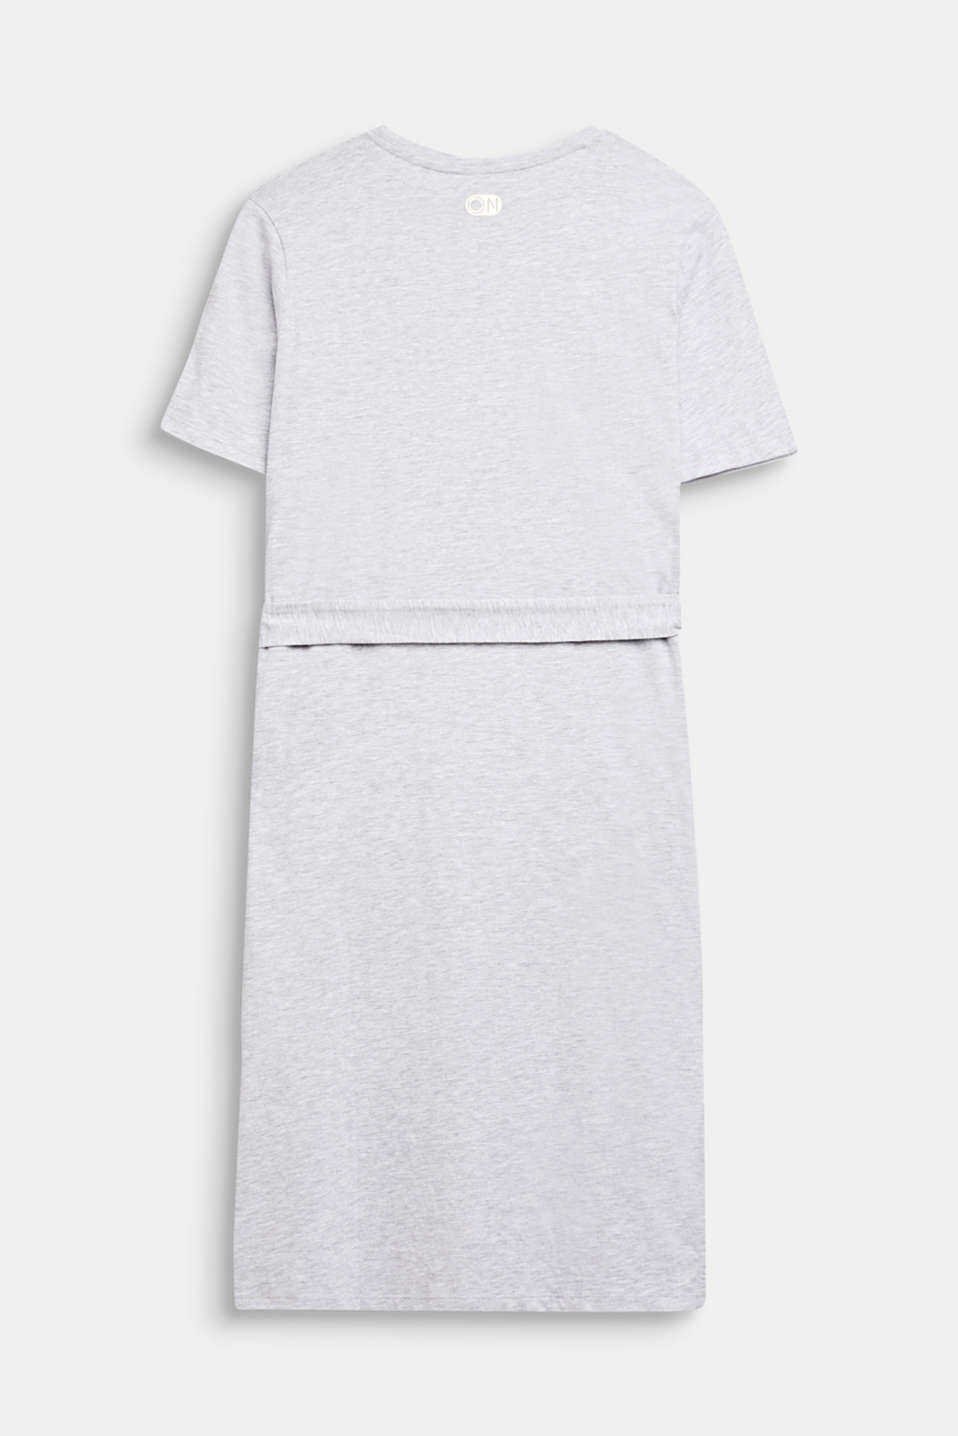 Melange shirt dress made of jersey, LCHEATHER SILVER, detail image number 1